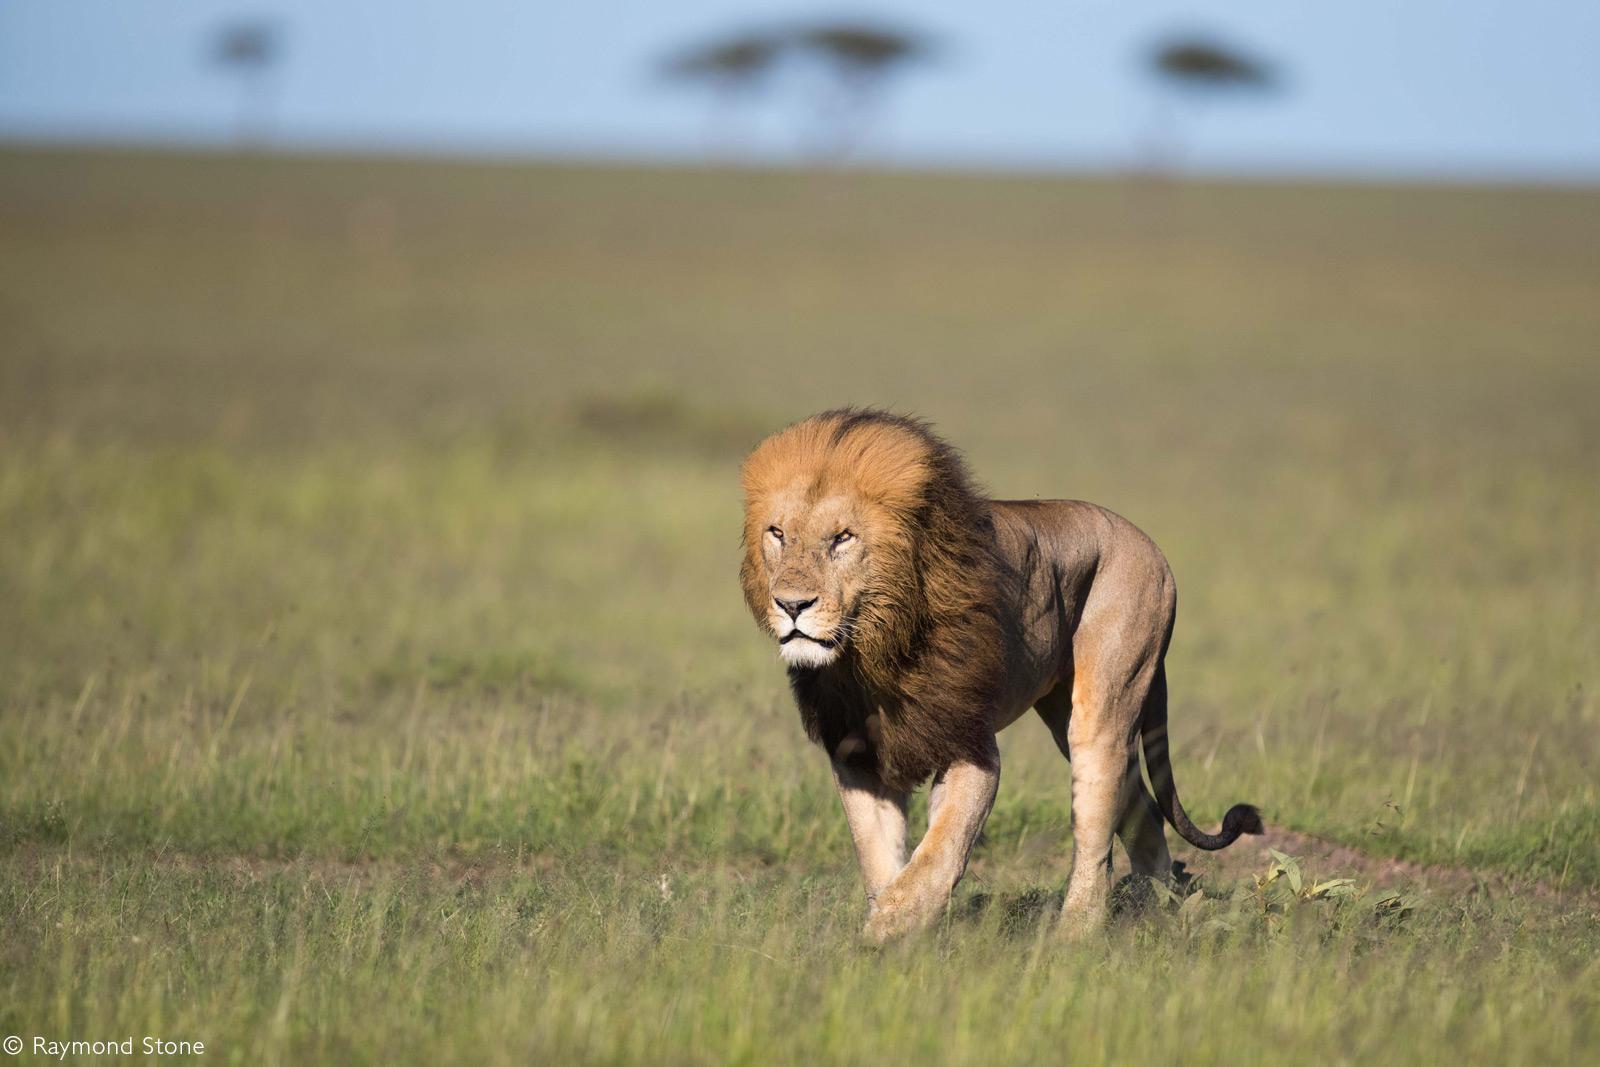 Male lion leading his pride. Maasai Mara National Reserve, Kenya © Raymond Stone